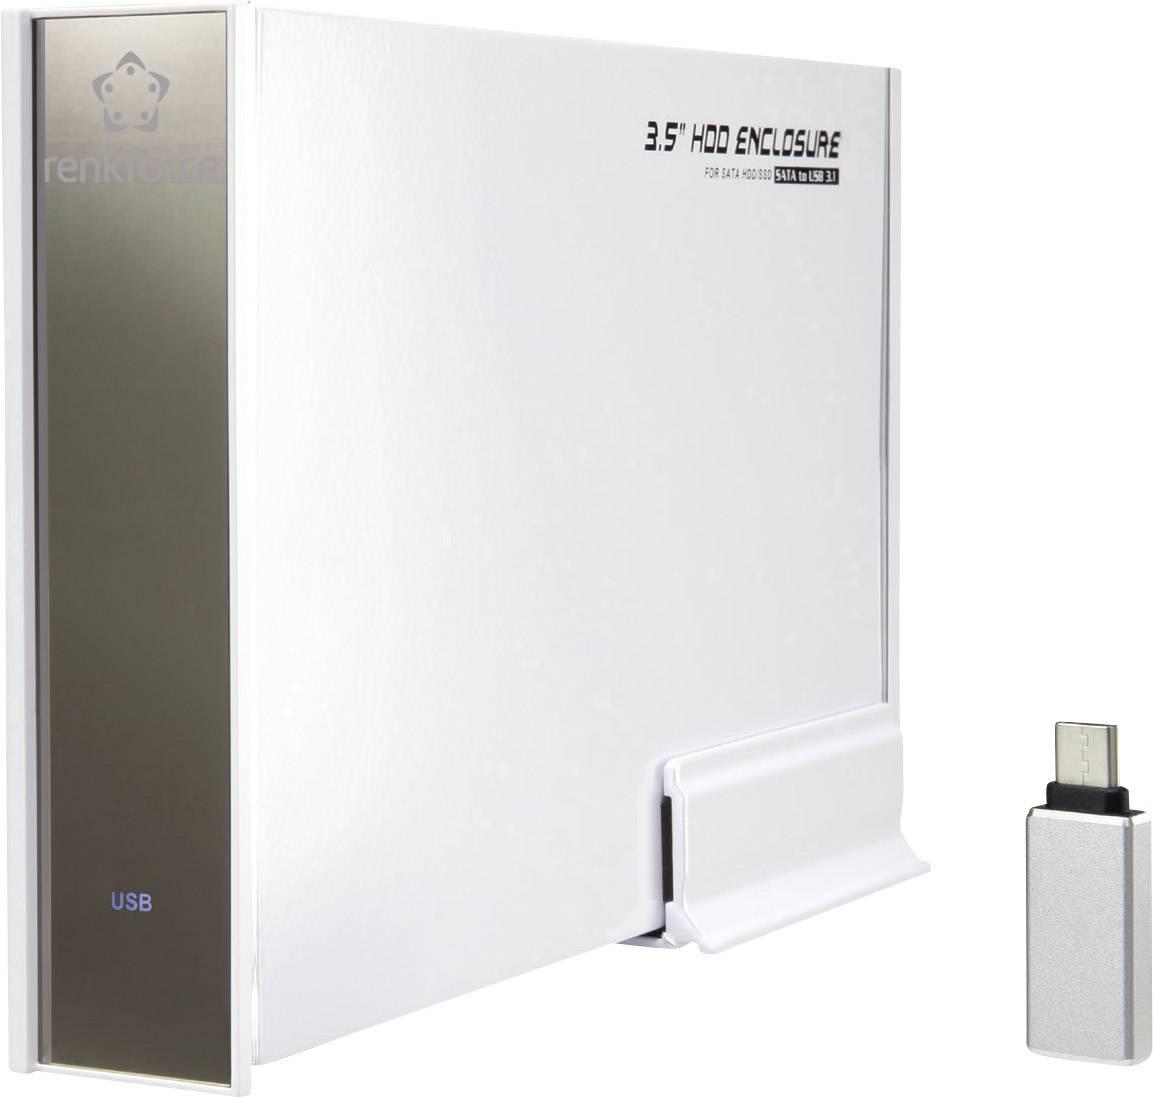 "Pouzdro pevného disku SATA 3.5 "" Renkforce RF-4315122 USB 3.1"